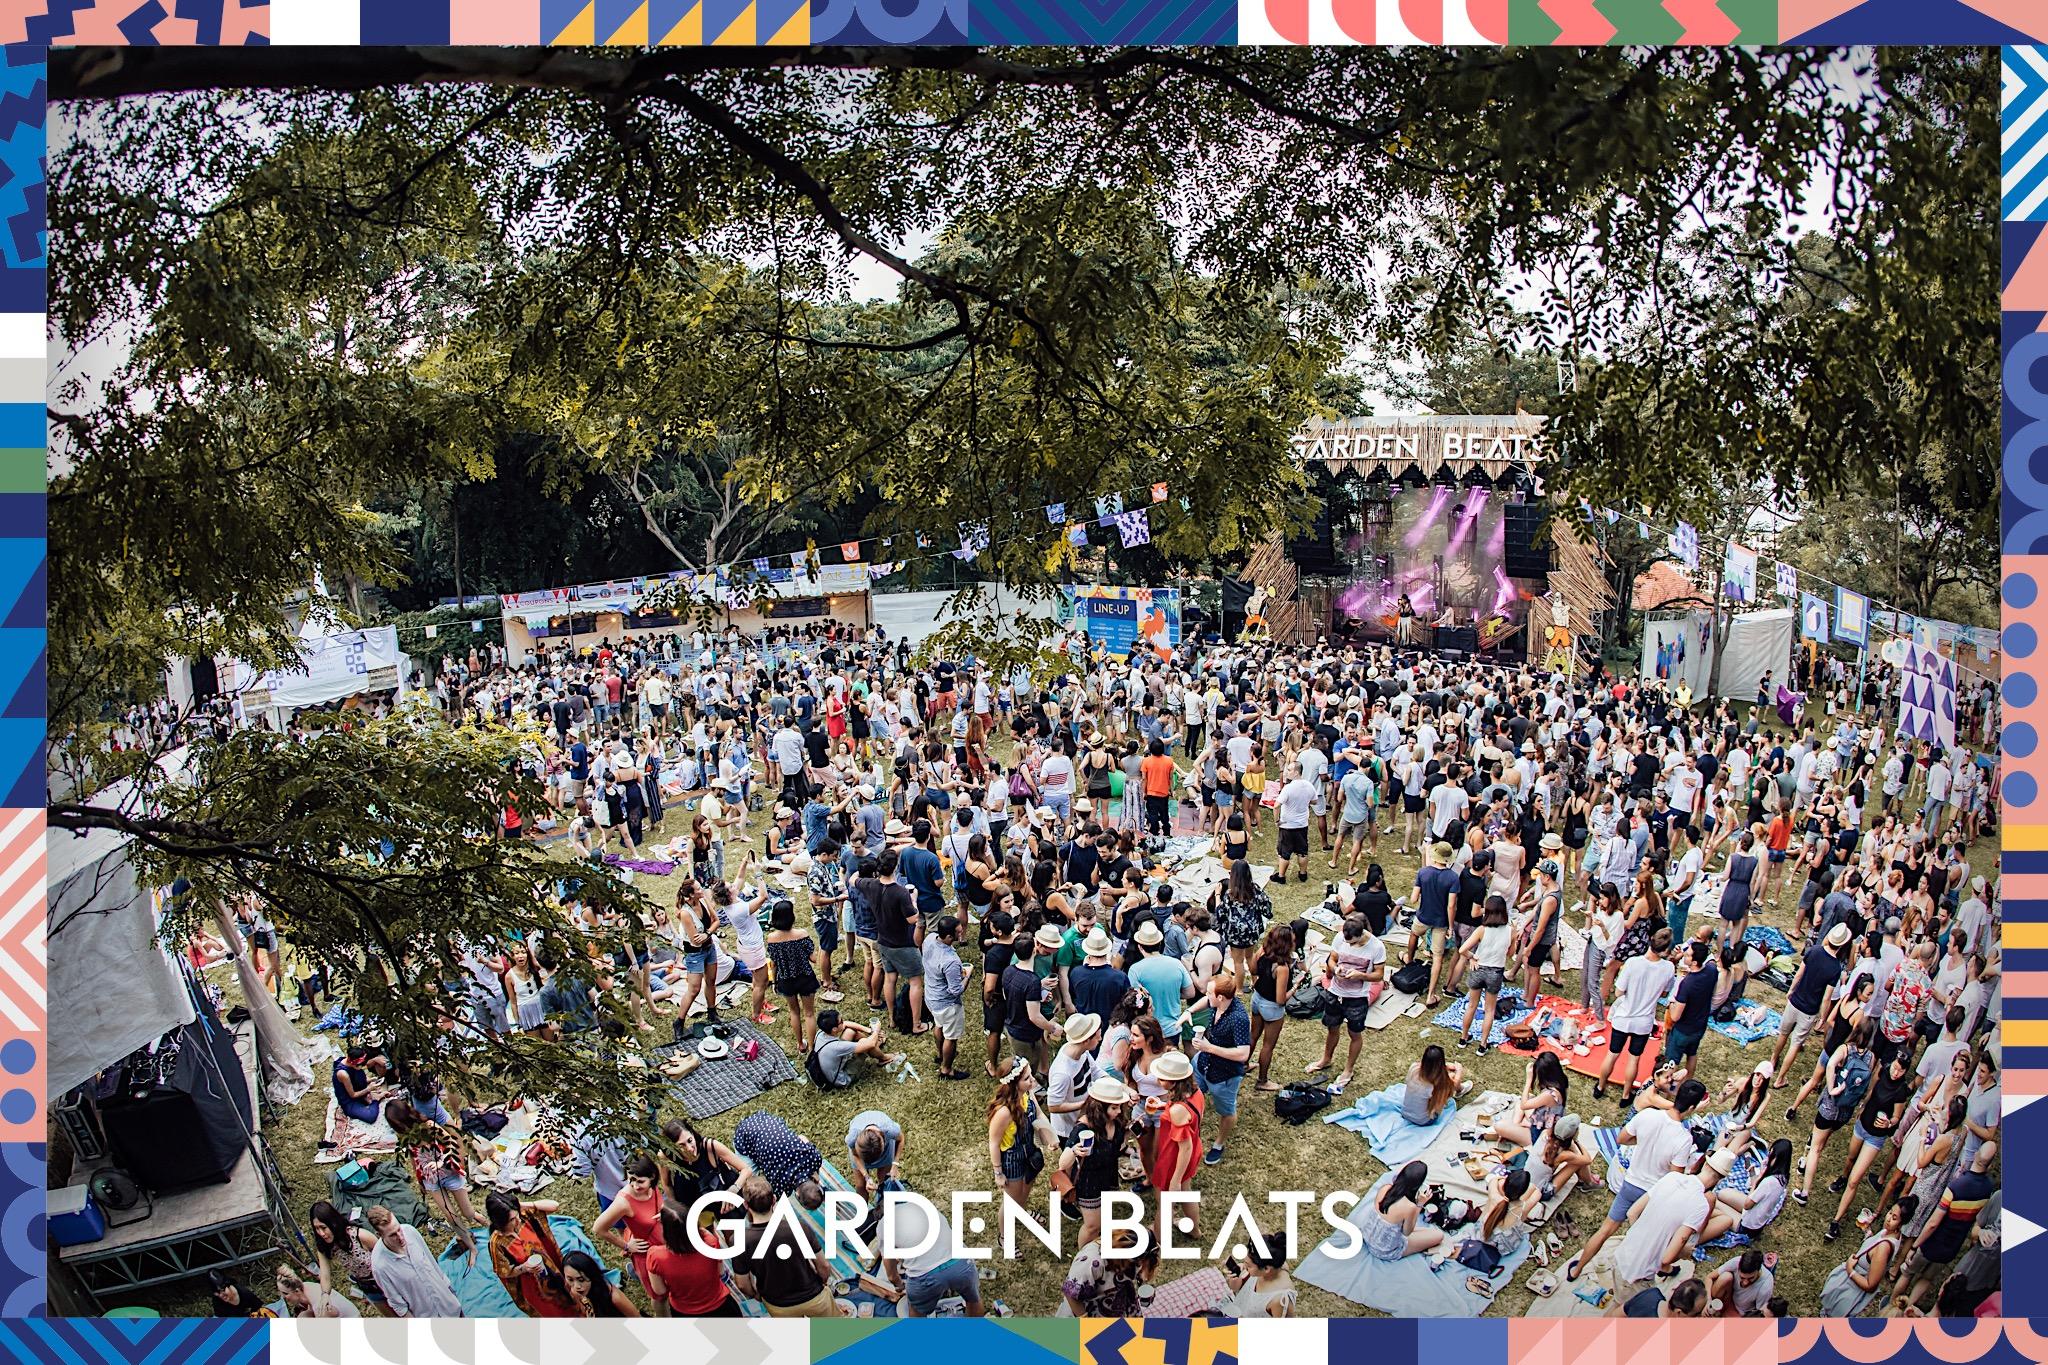 18032017_GardenBeats_Colossal650_WatermarkedGB.jpg